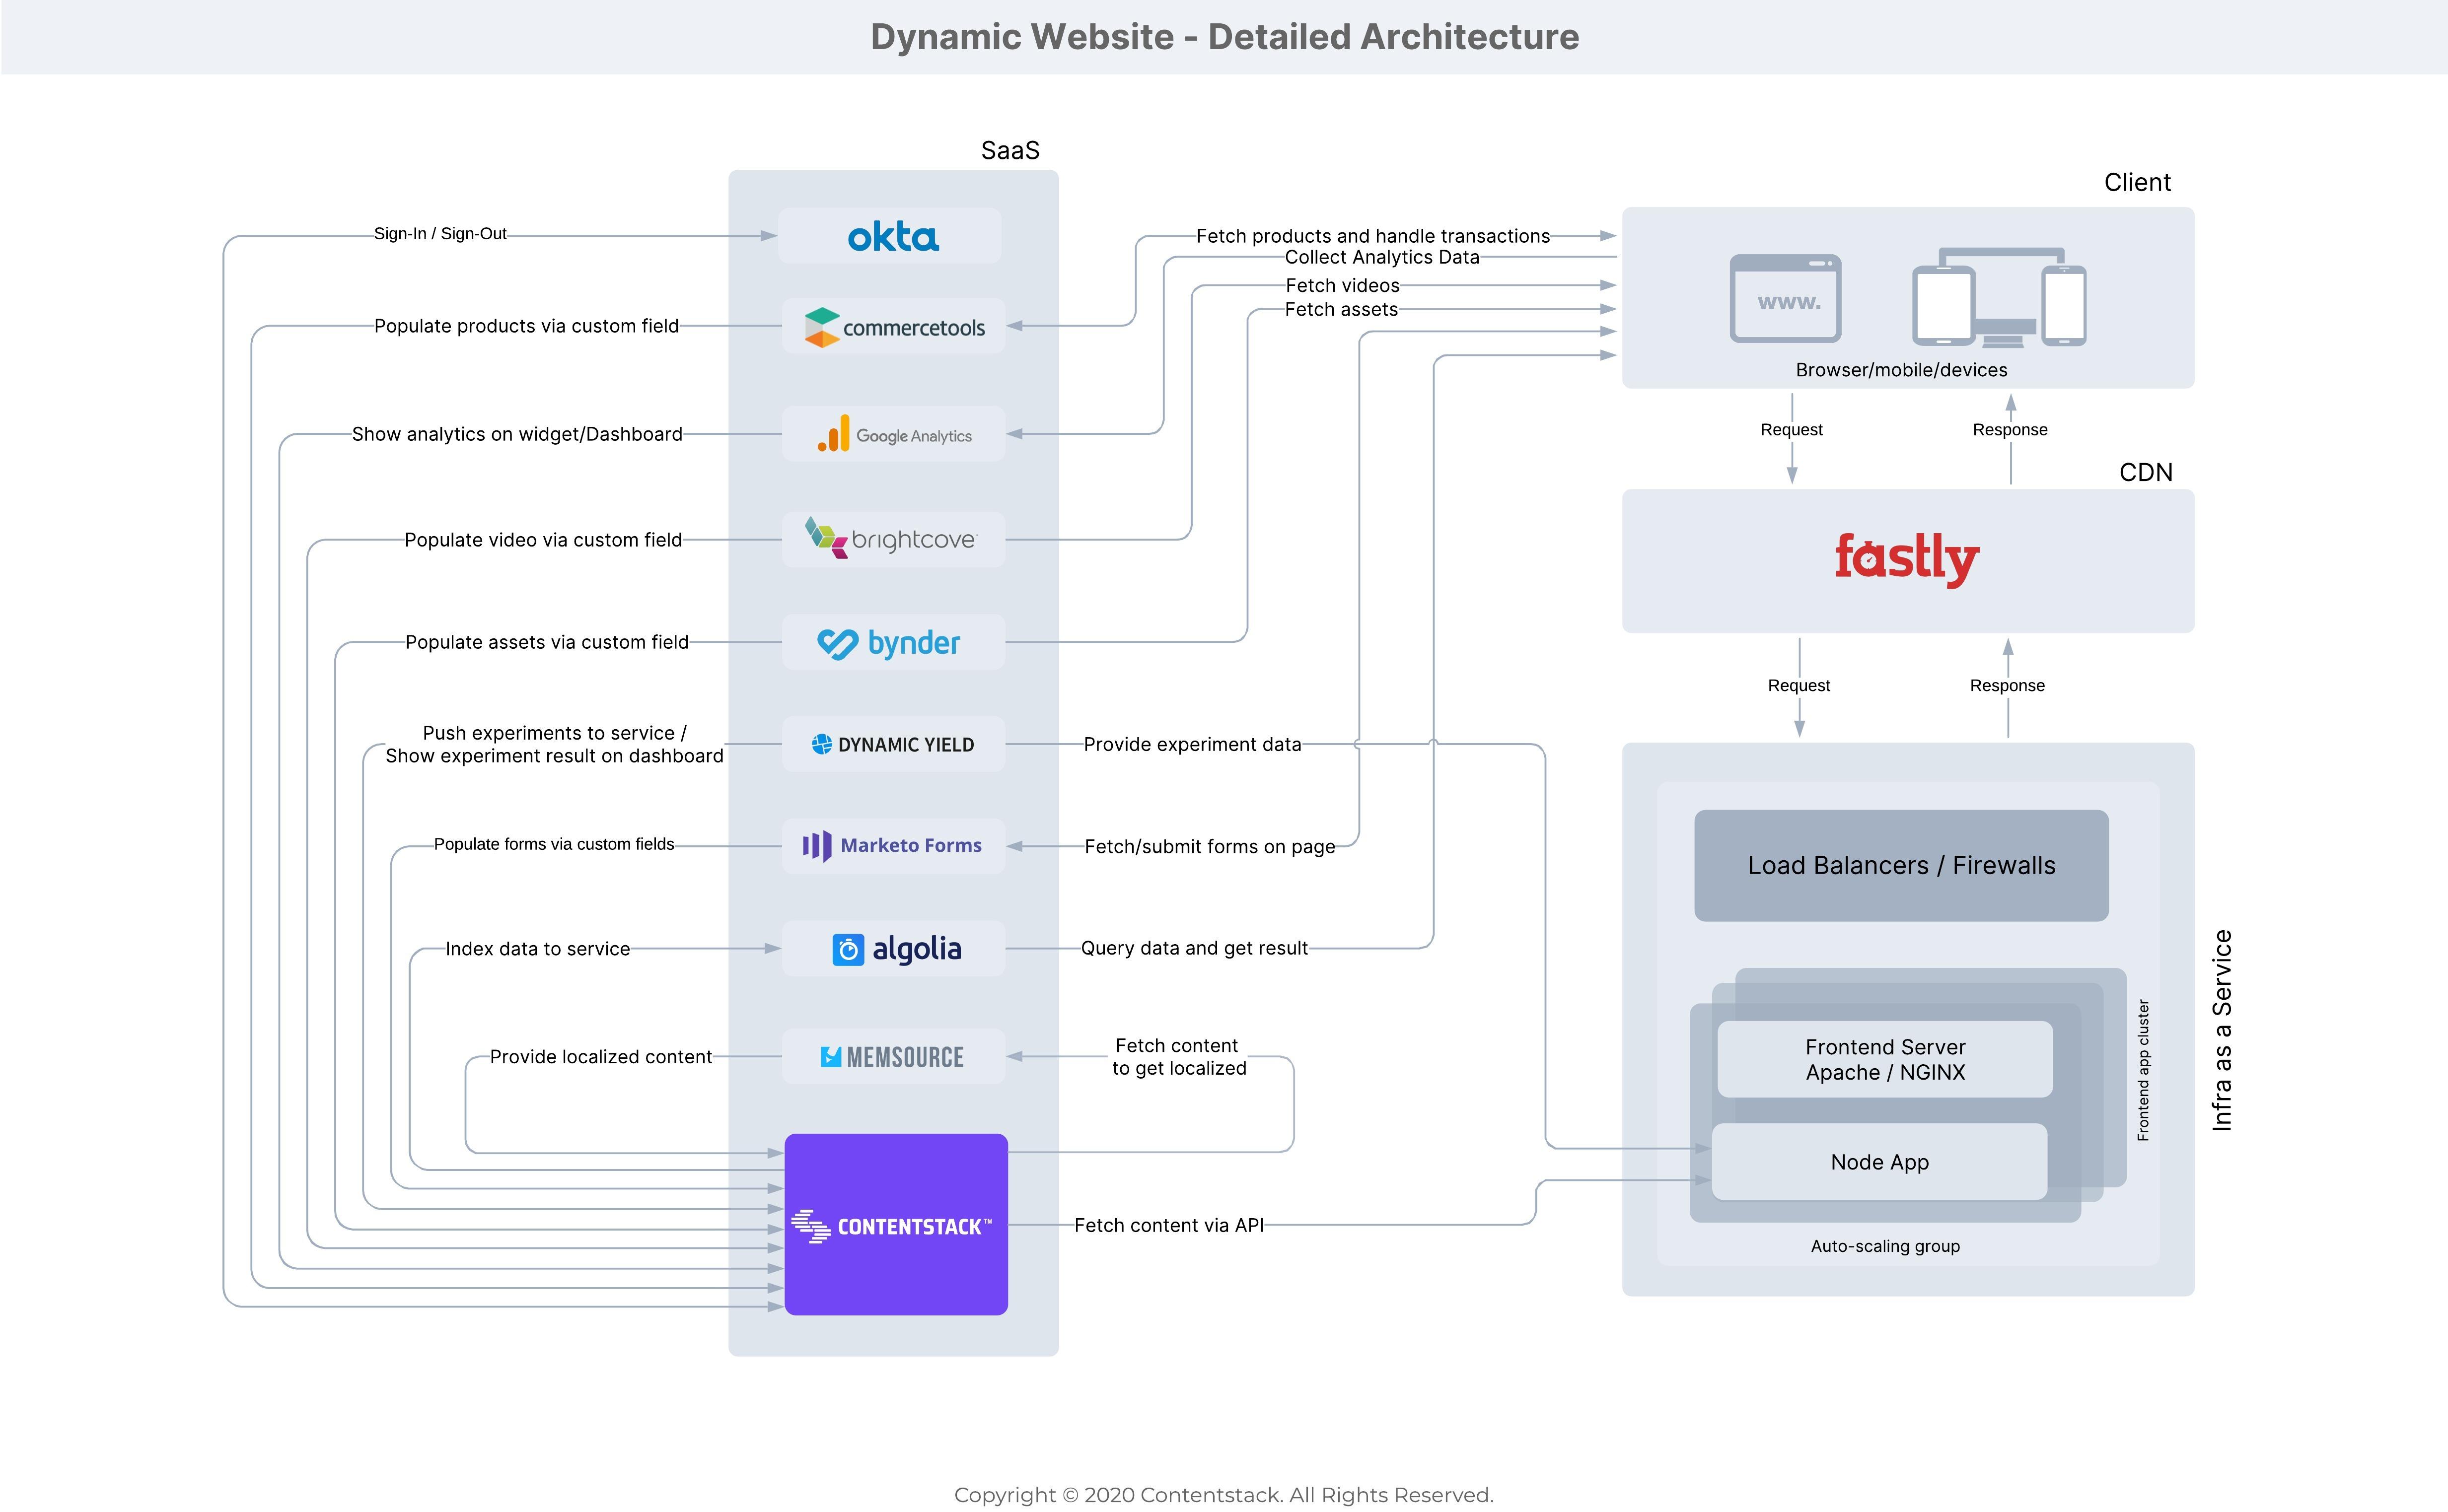 Dynamic_Website_-_Detailed_Arhitecture.jpeg